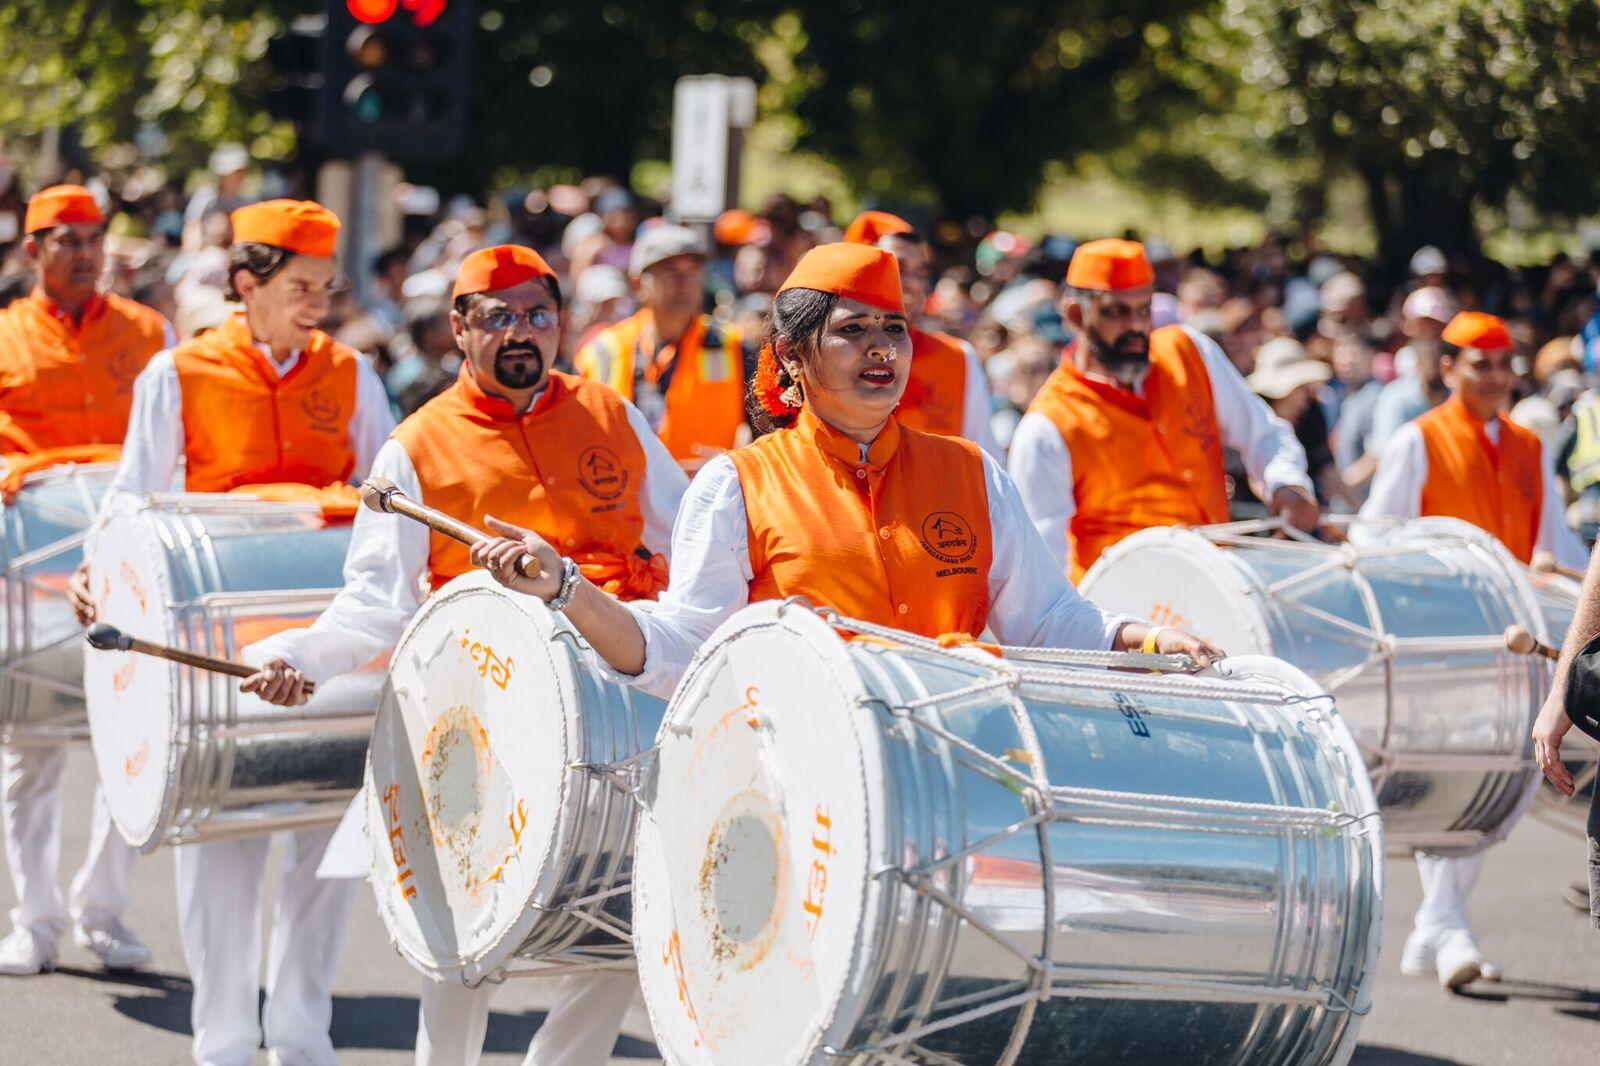 moomba-2017-parade-drummers.jpg